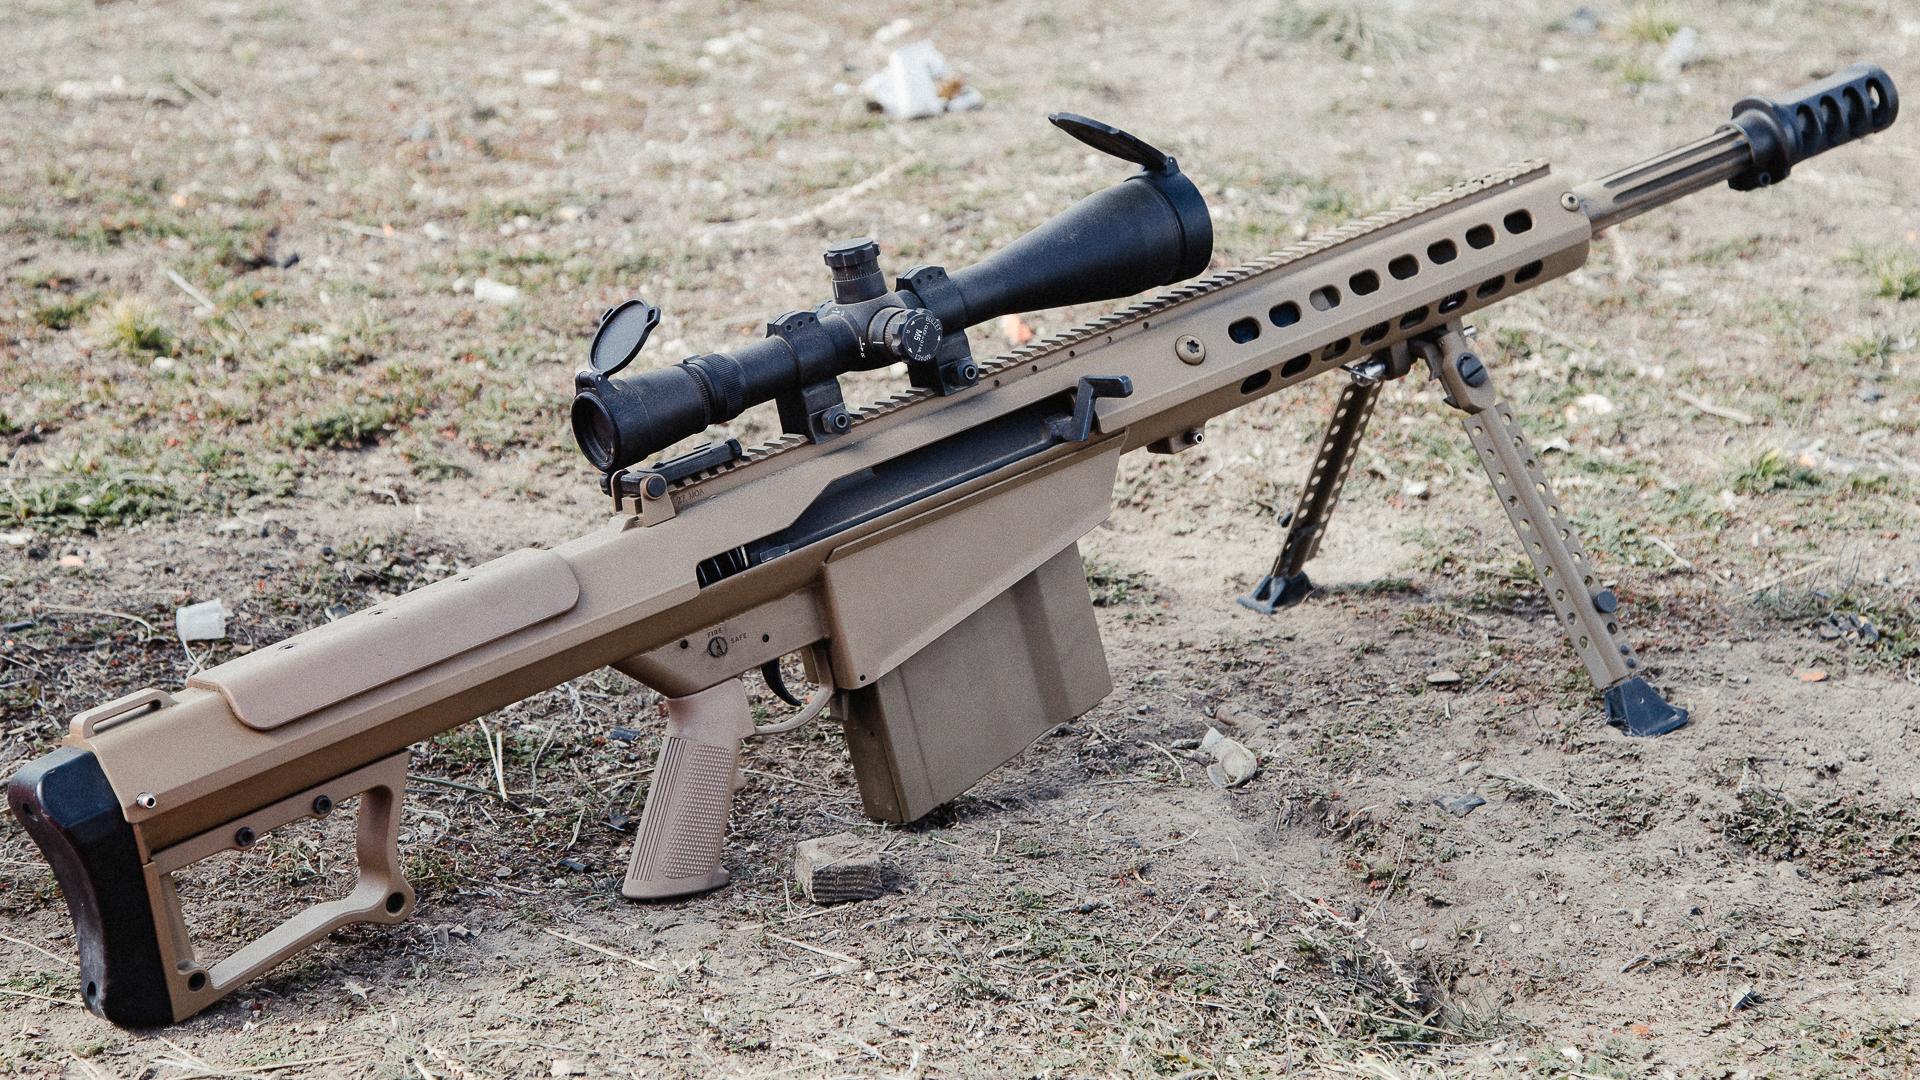 magnum sniper pitmaker - HD1920×1080